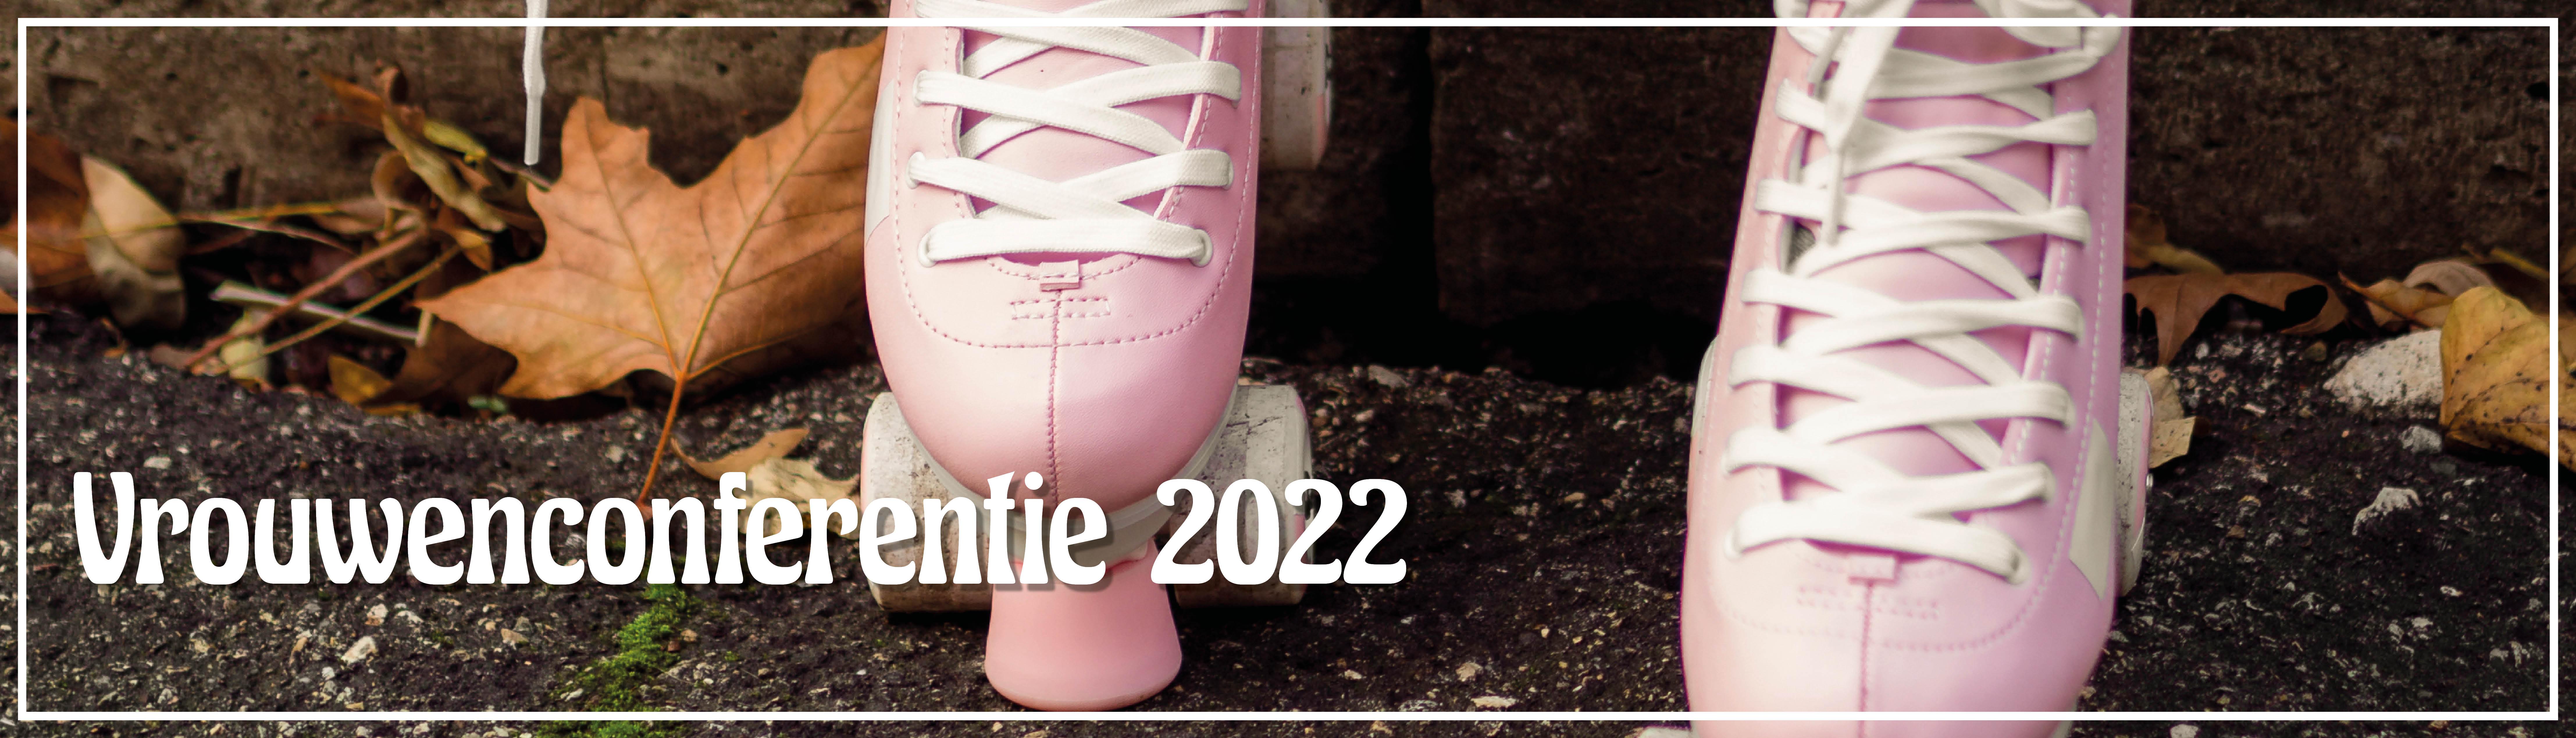 Vrouwenconferentie 2022